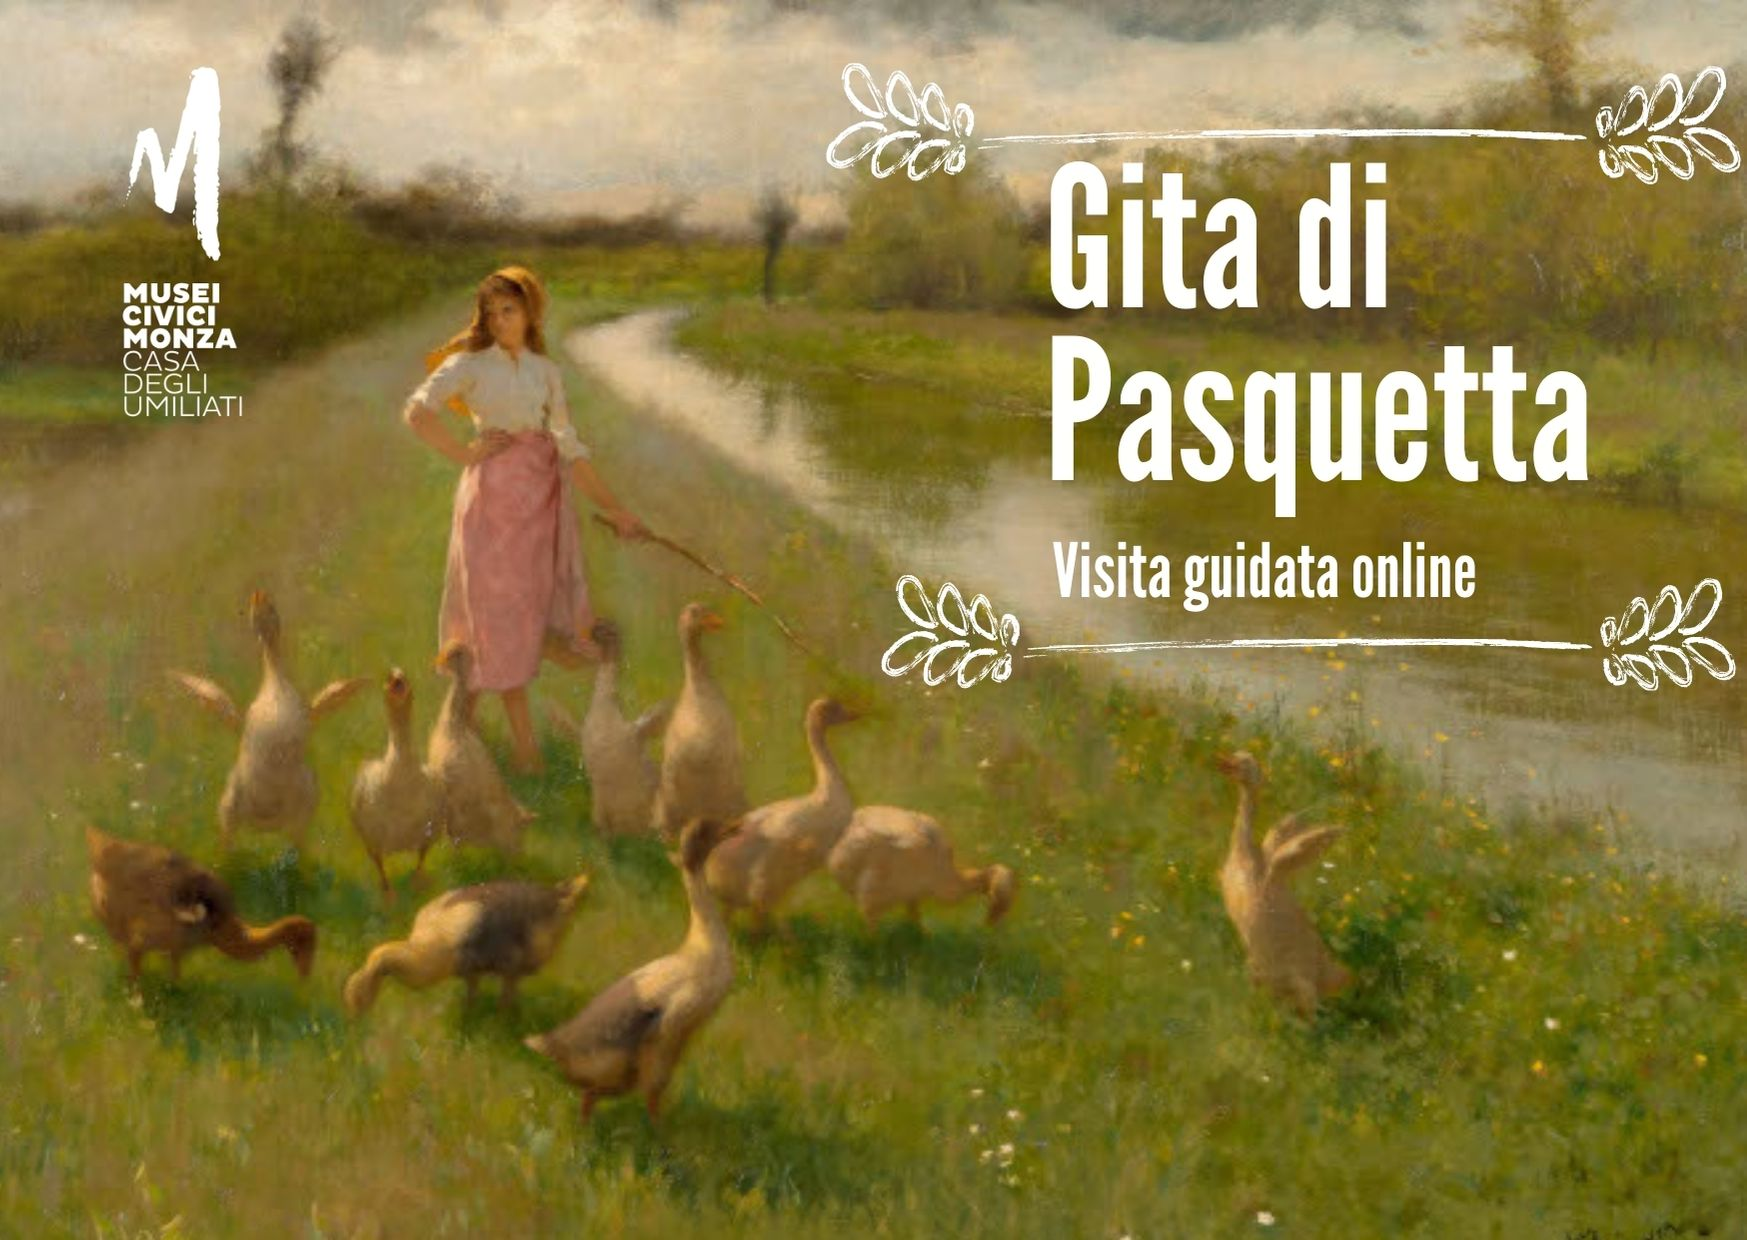 http://www.icom-italia.org/wp-content/uploads/wpforms/10320-faf7ed92f83be88bc622f726ed042c0c/Gita-di-Pasquetta-ada40e9a7fb0520d0f0d1155277796c1.jpg